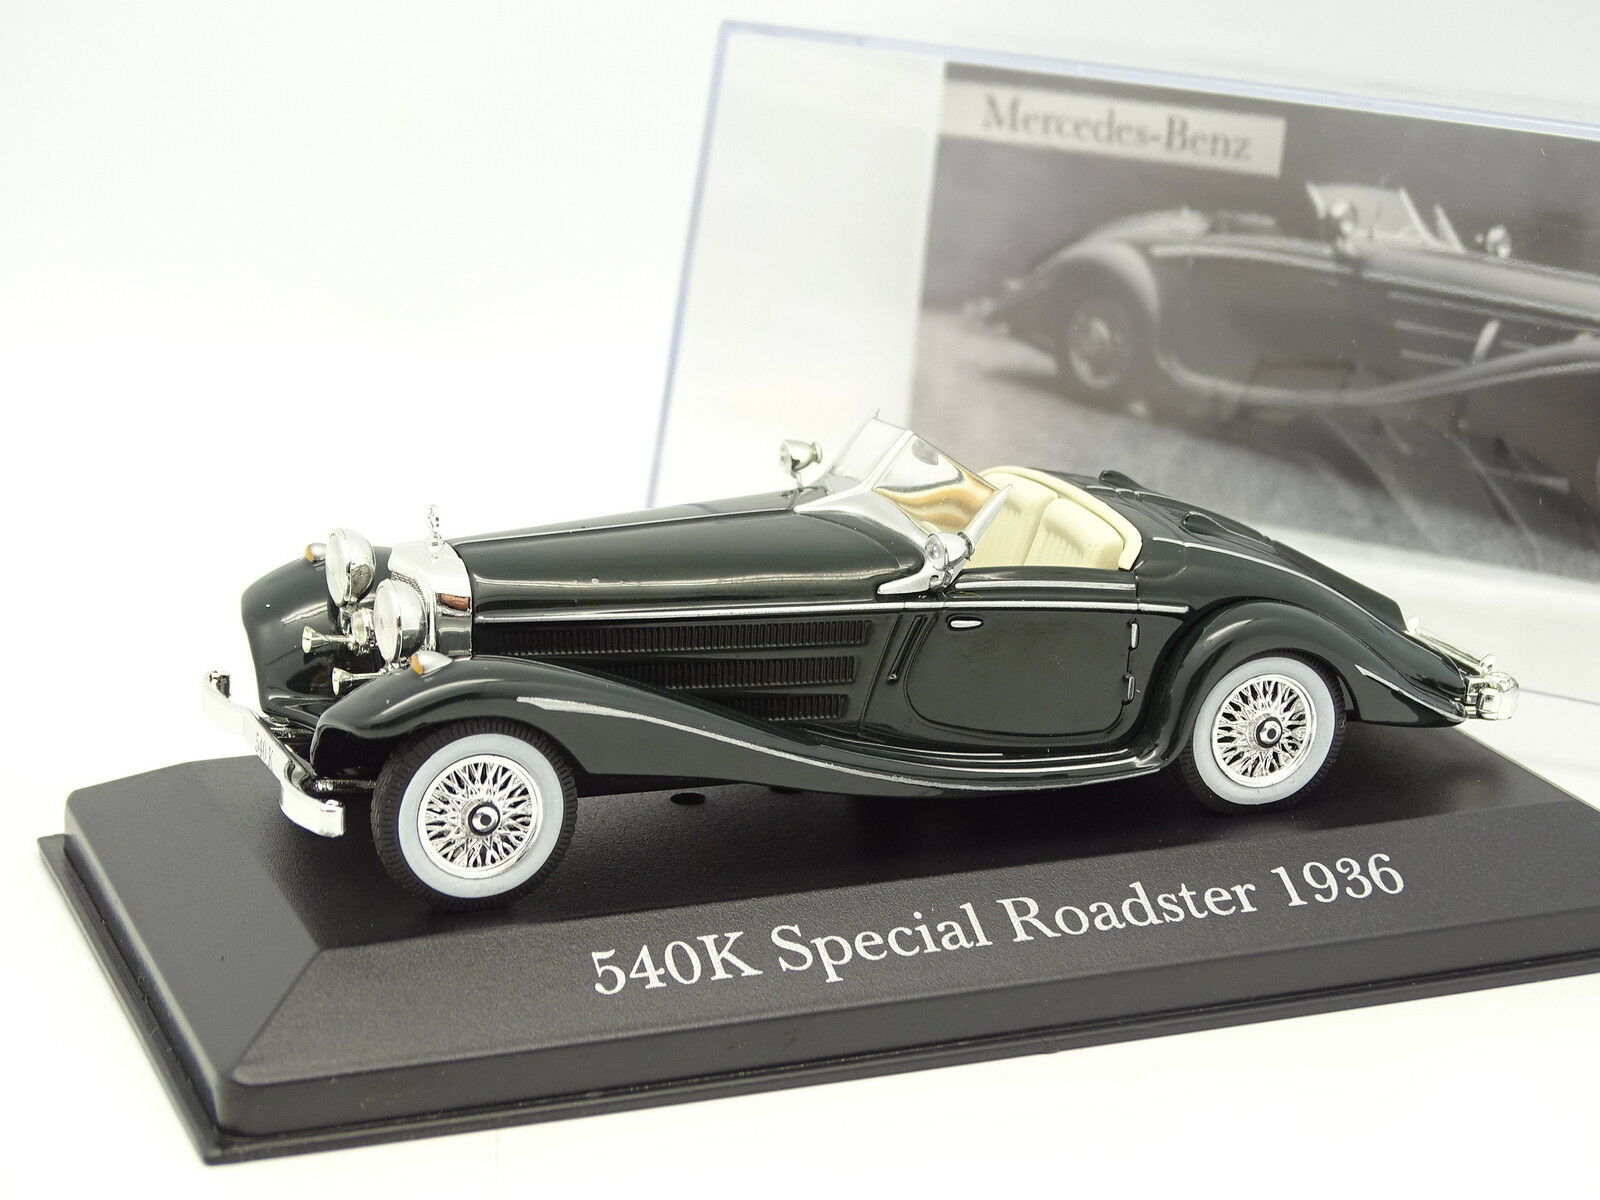 Stampa Ixo Ixo Ixo 1 43 - Mercedes 540k Special Roadster 1936 2a8c6a